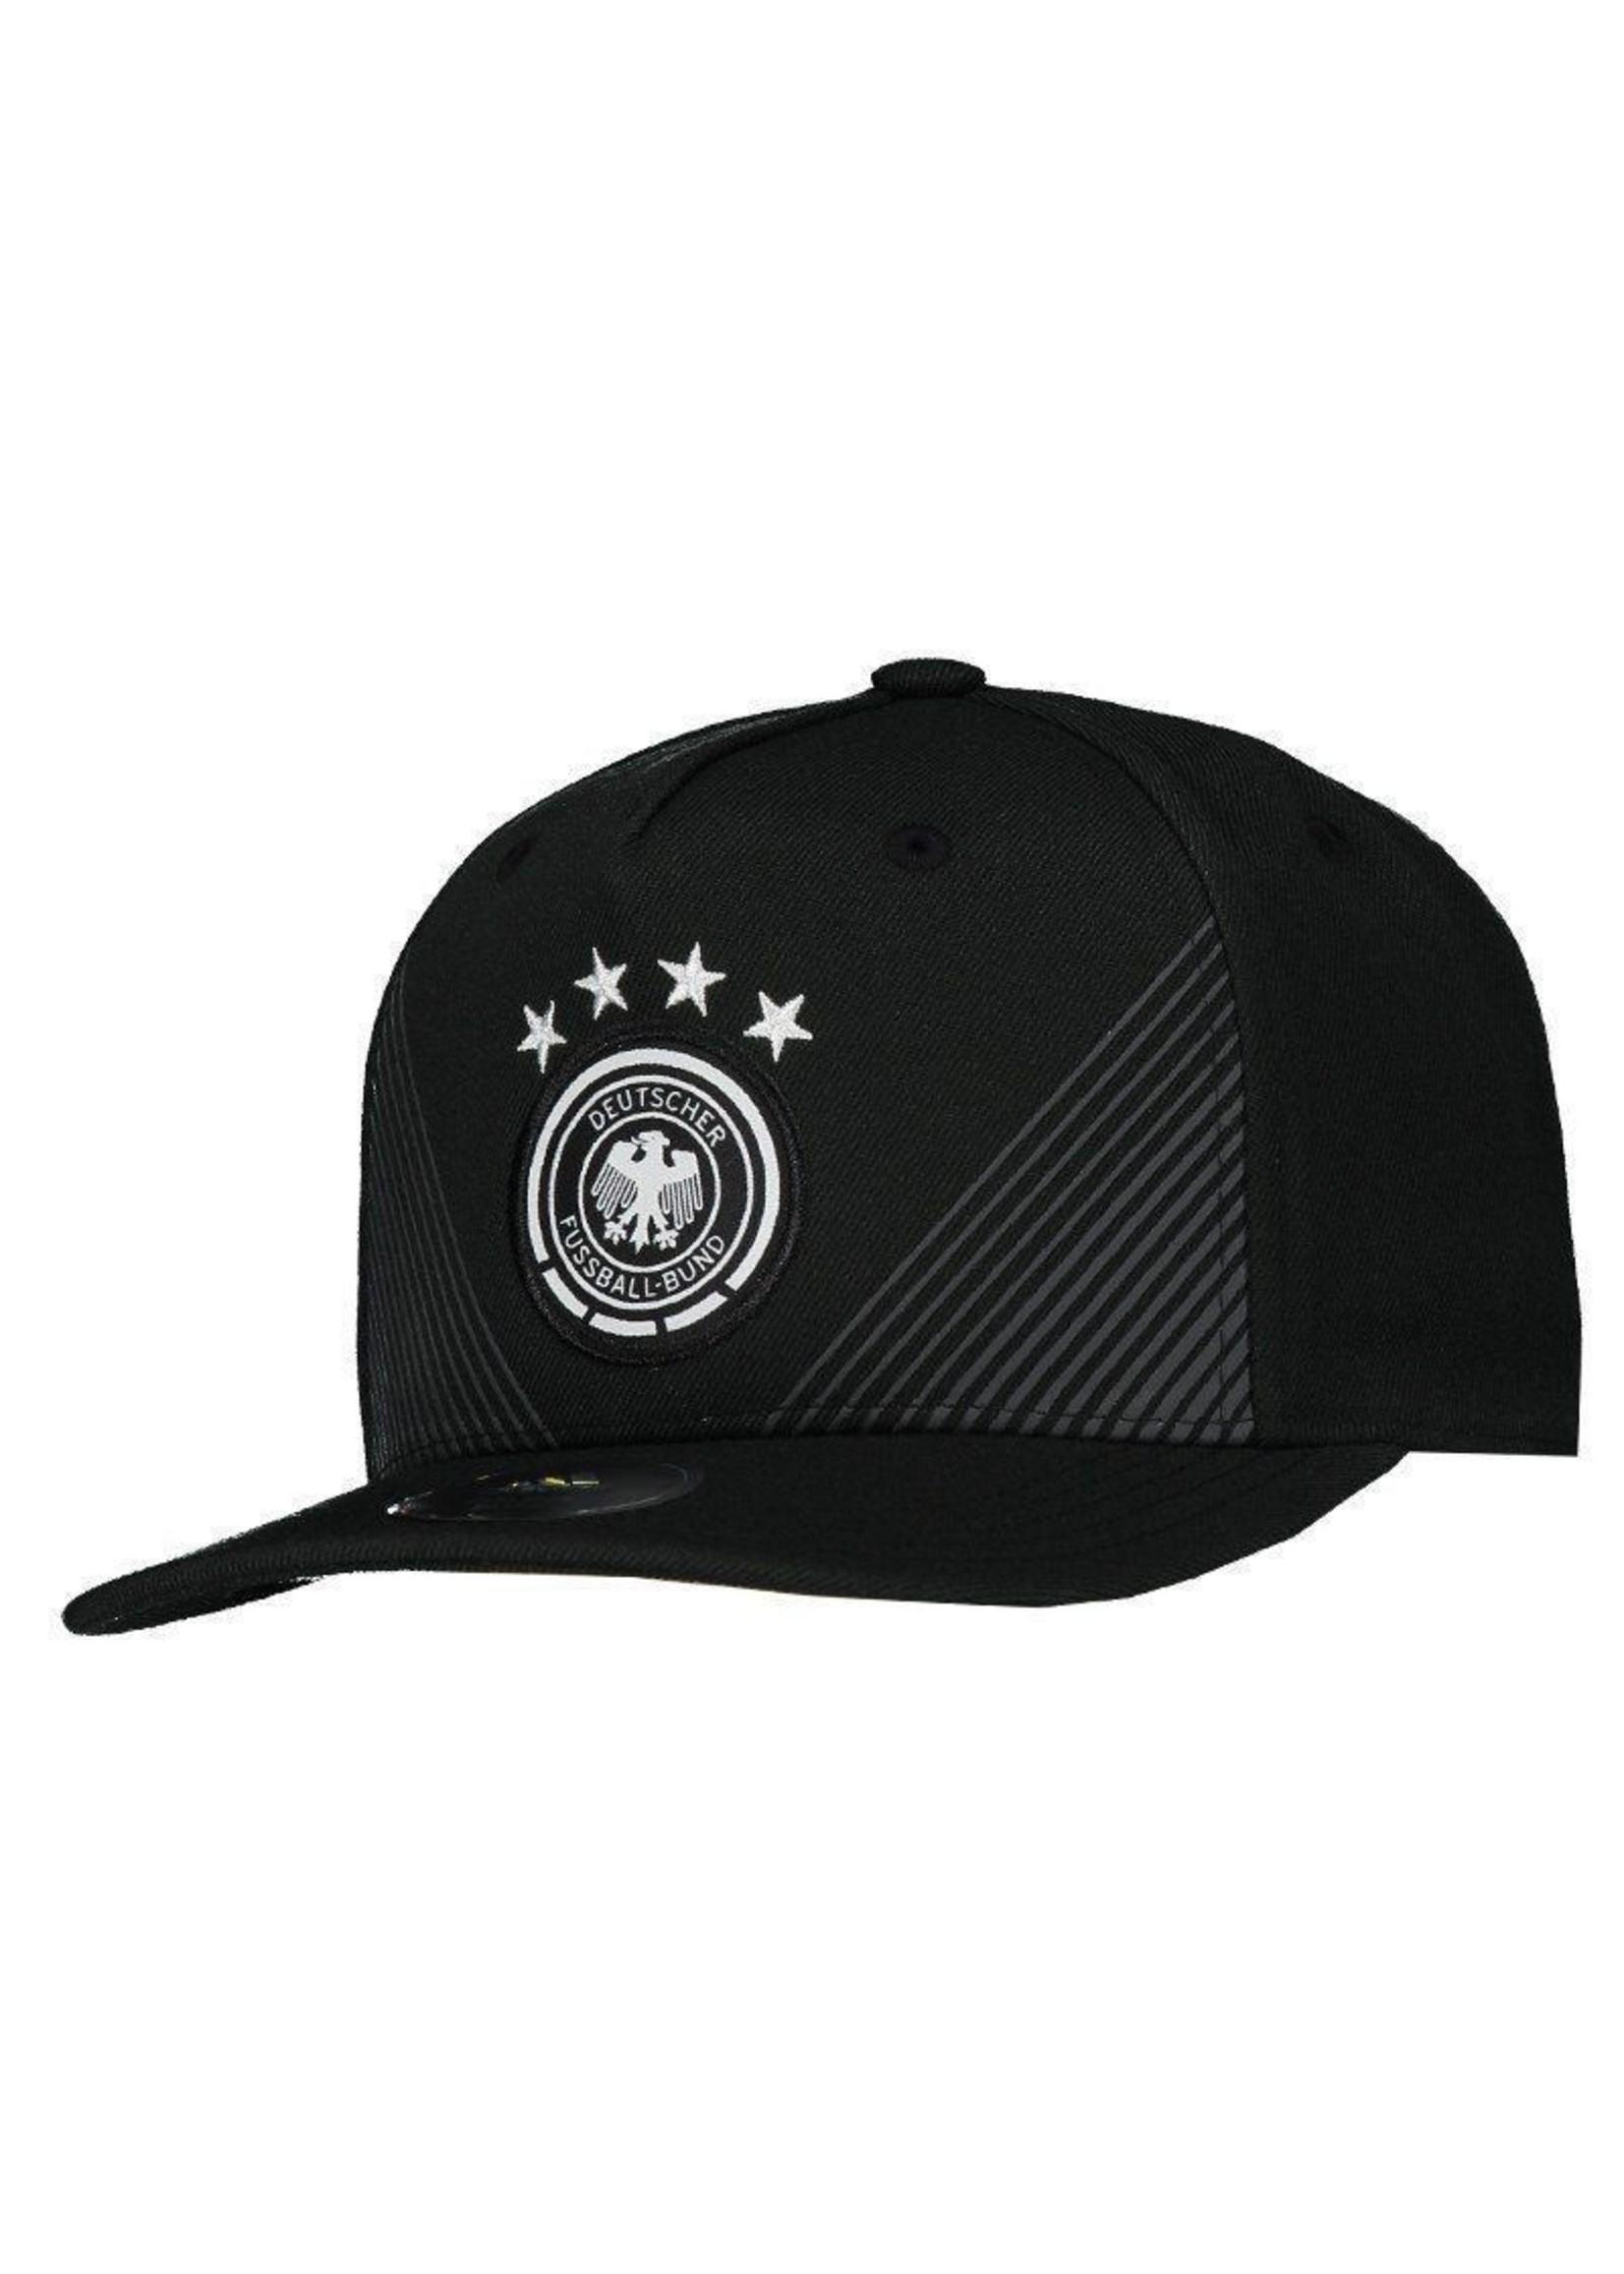 Adidas Germany Cap - Black Flat